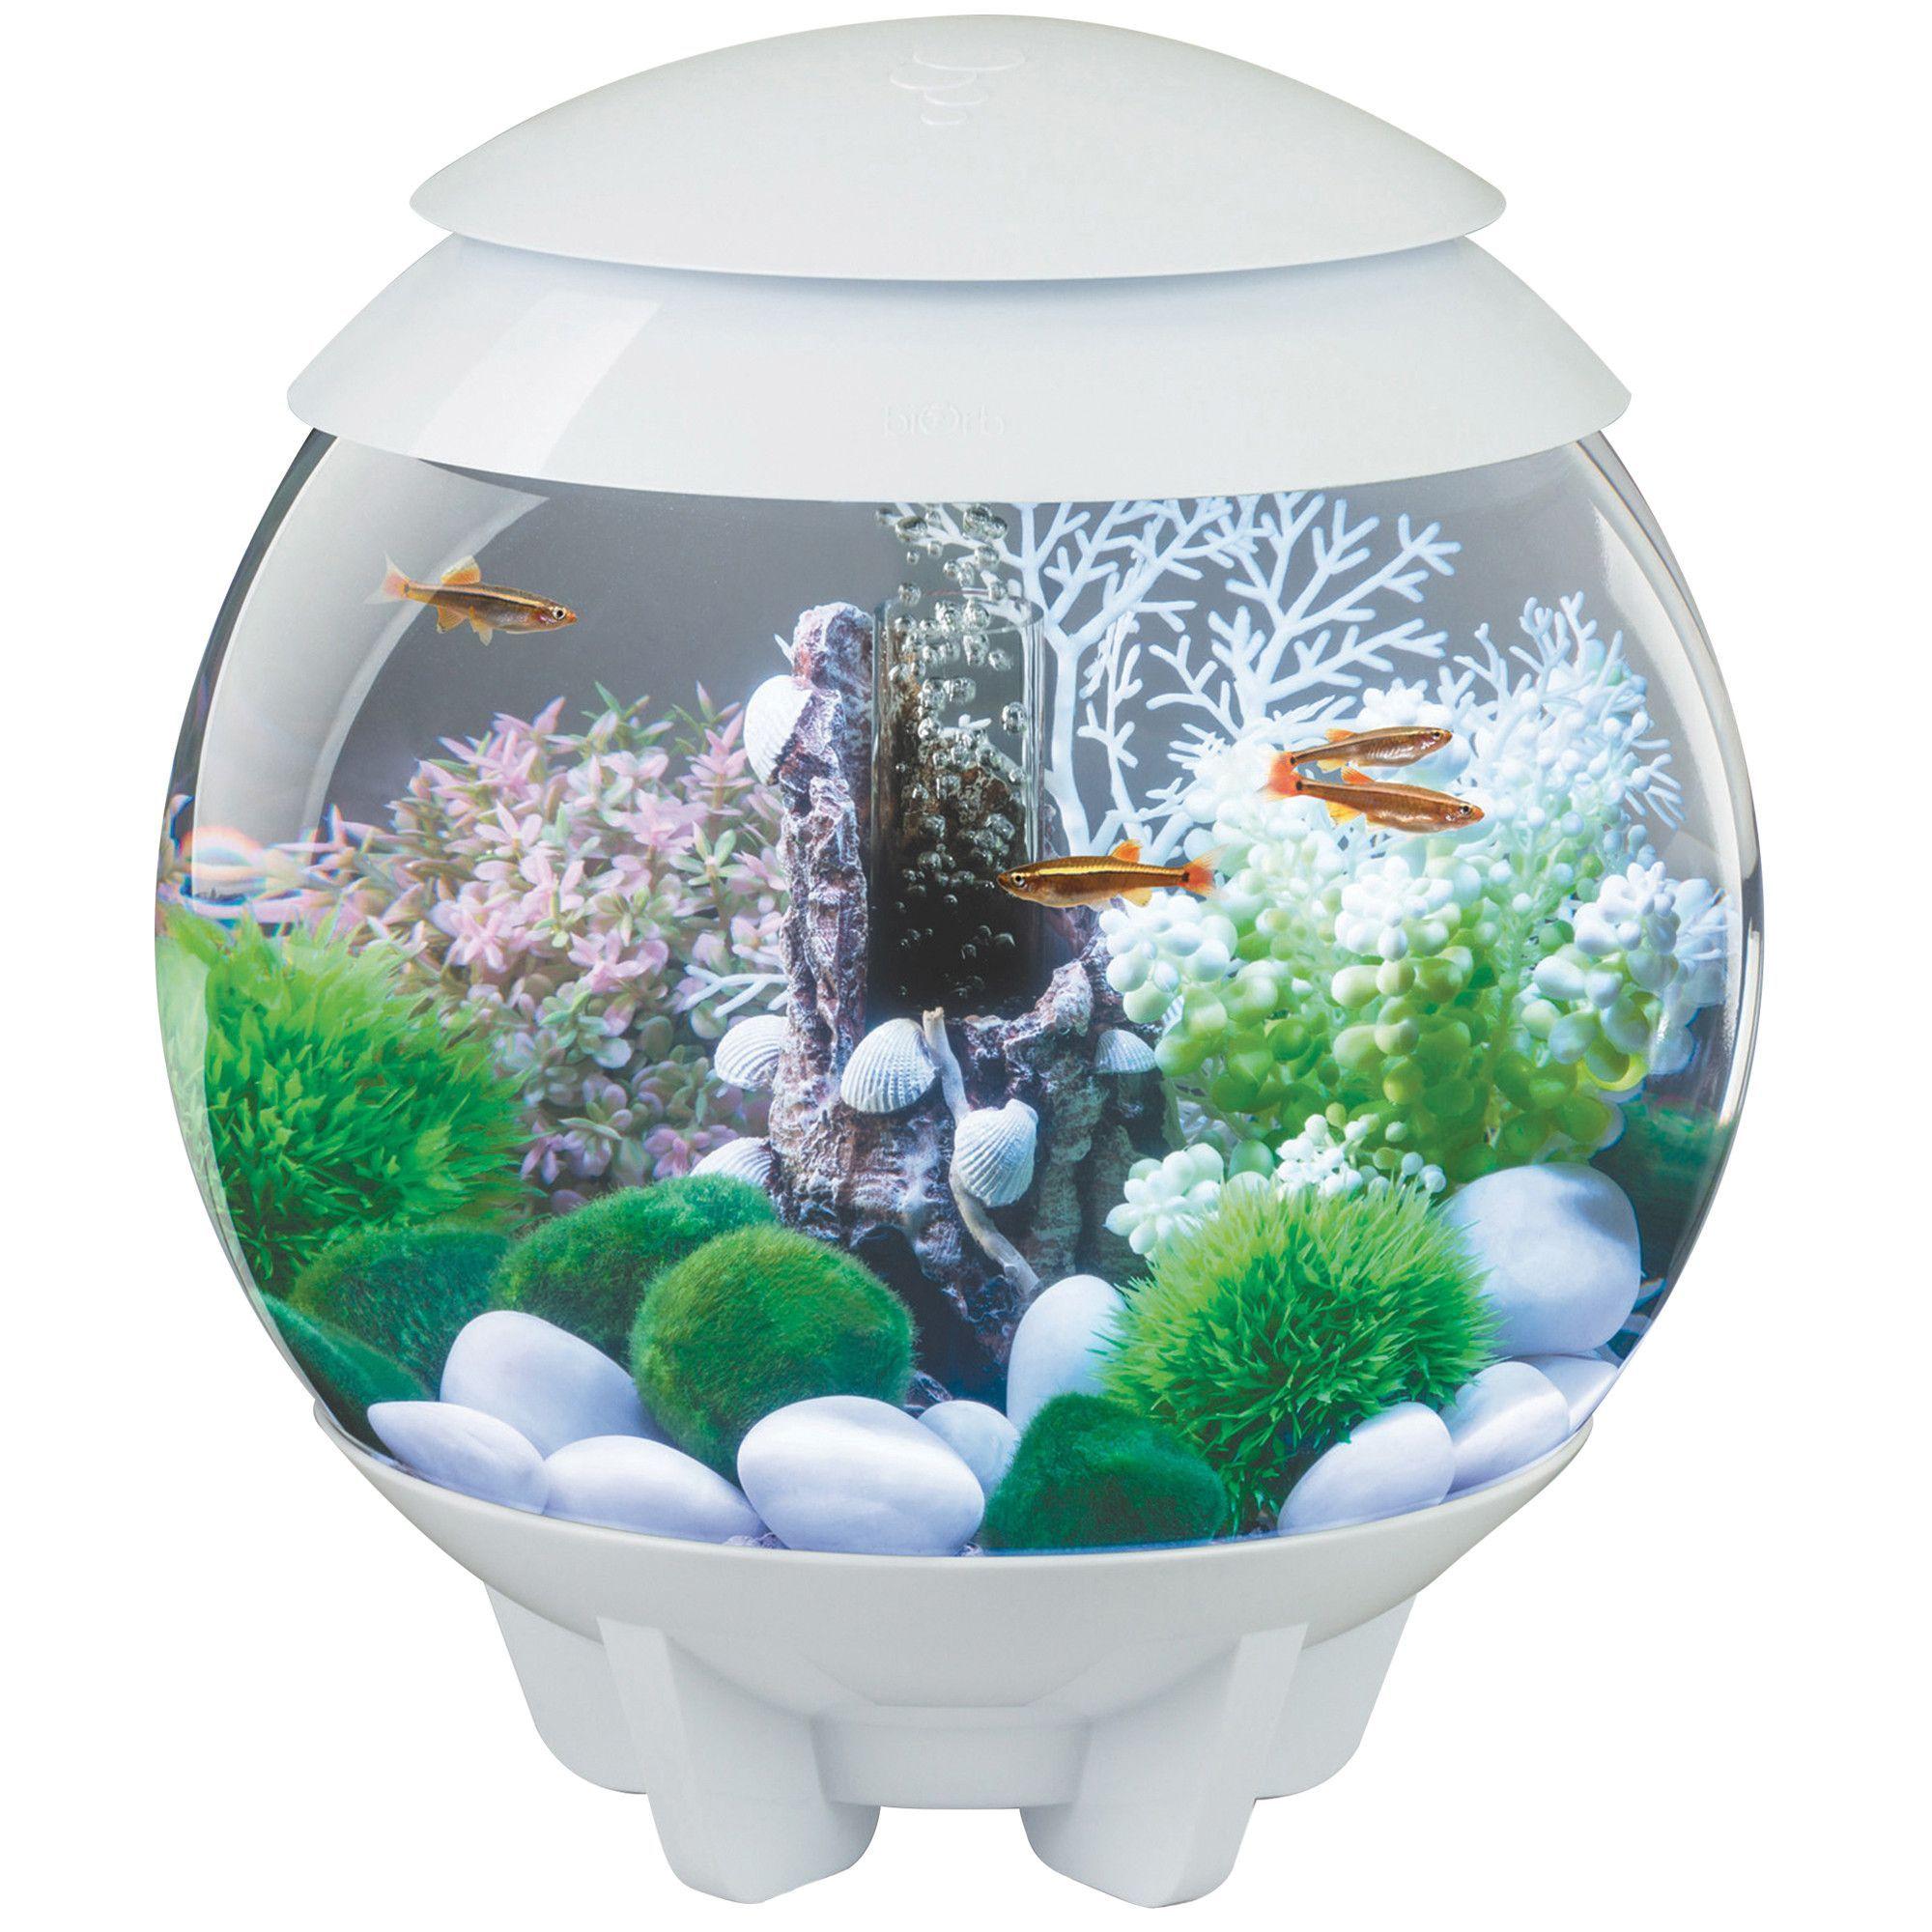 biOrb by Oase Halo MCR 4 Gallon Aquarium White Amazing